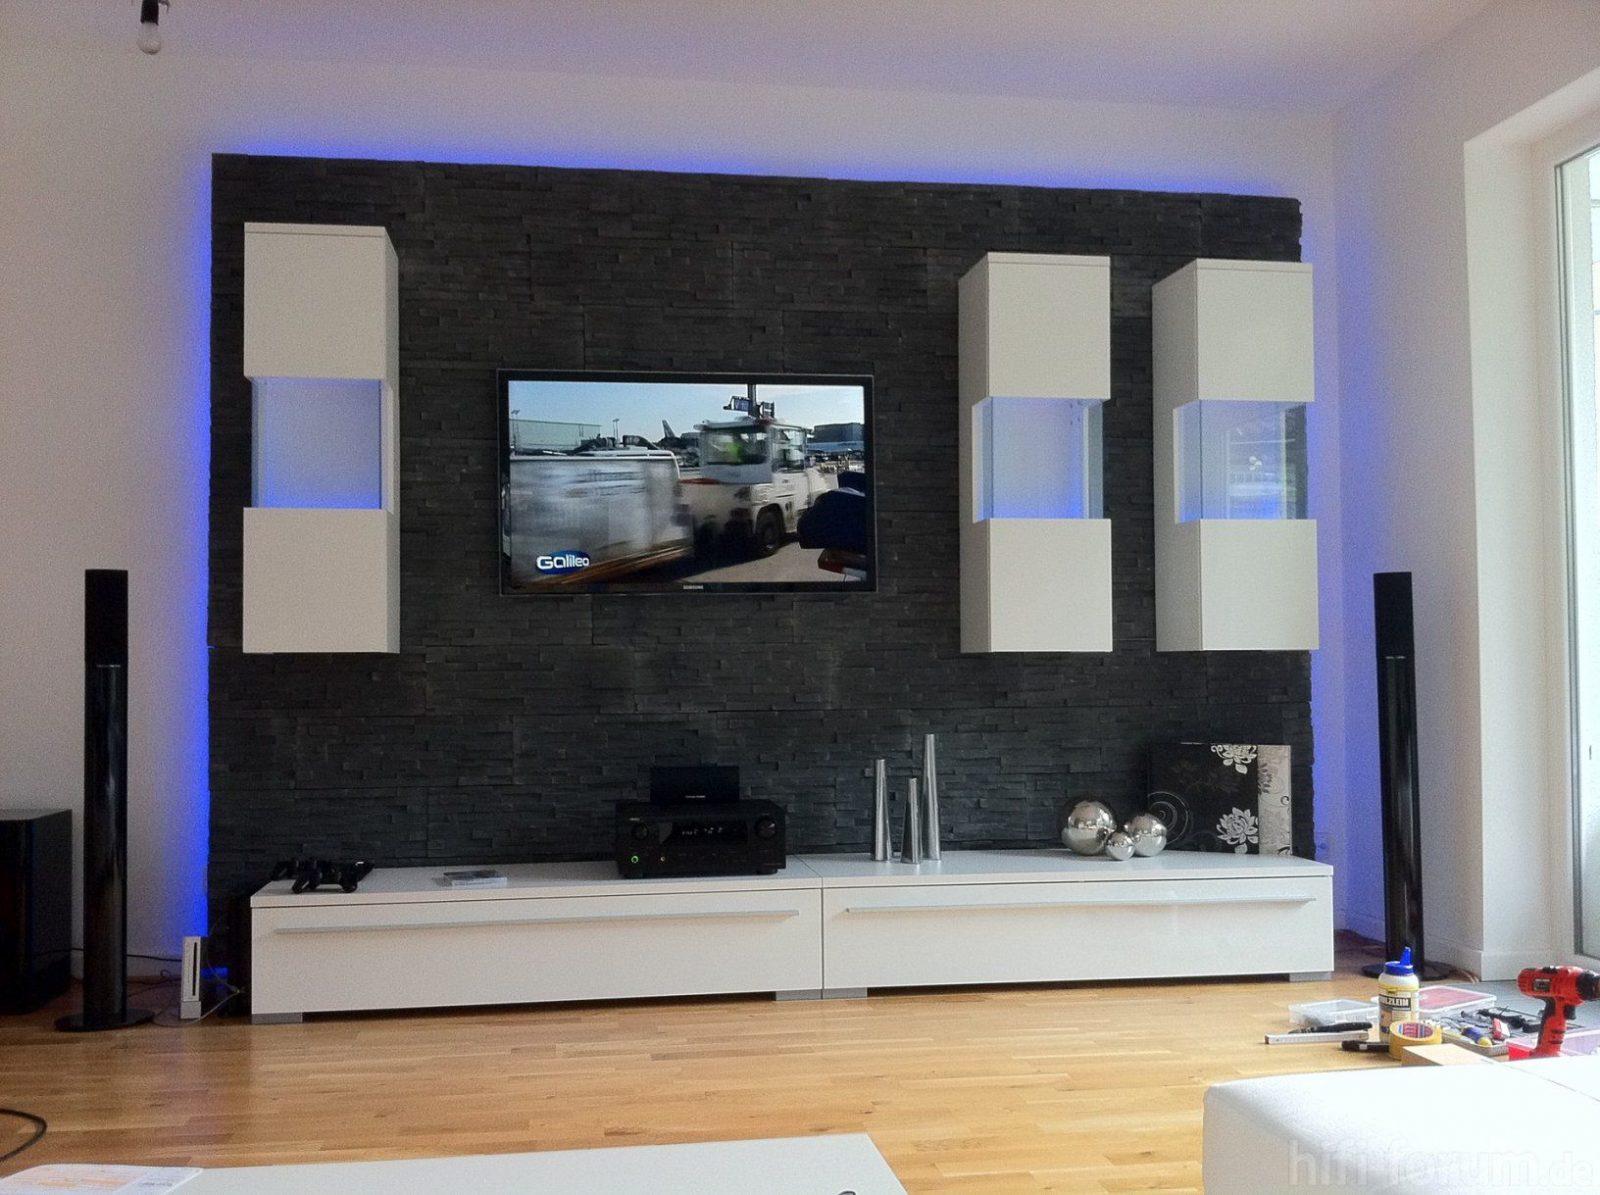 Tv Wand Selber Bauen Laminat Mit Tv Wand Selber Bauen Kosten Uf13 von Tv Wand Selber Bauen Kosten Bild